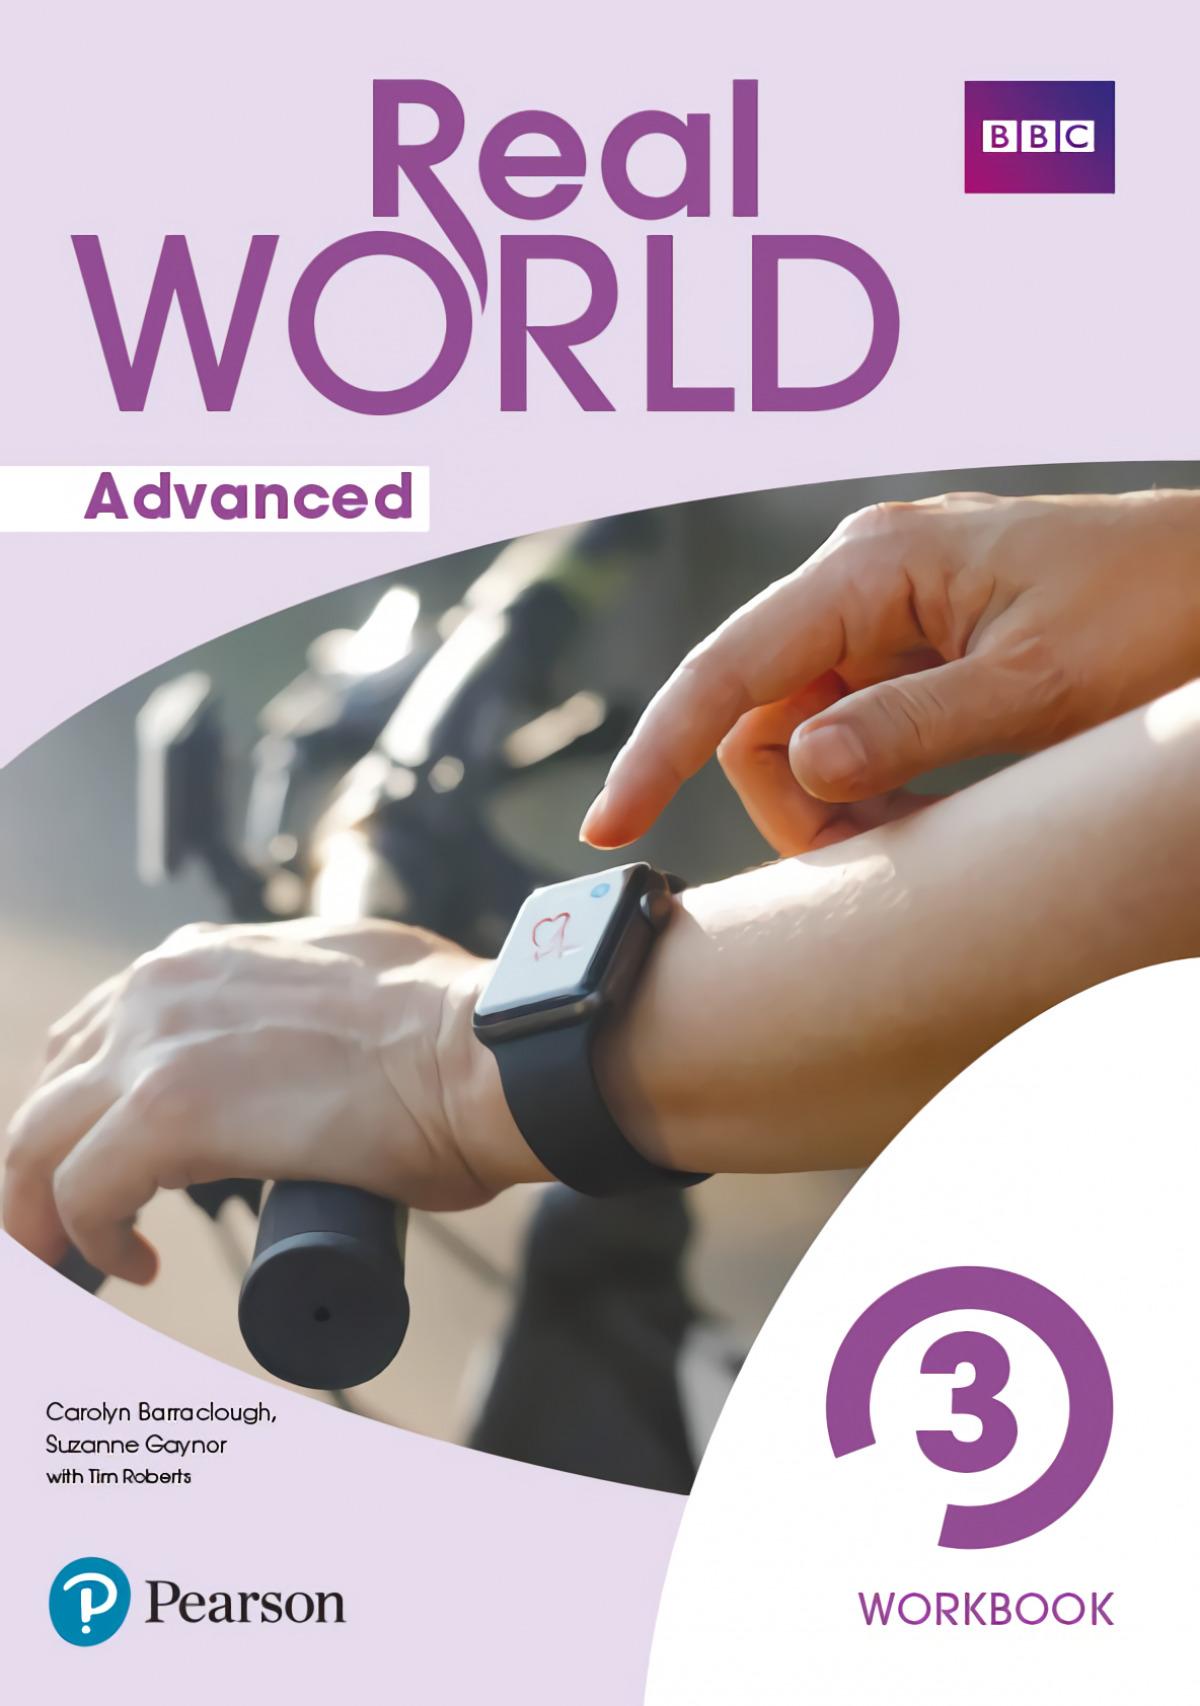 Real World Advanced 3 Workbook Print